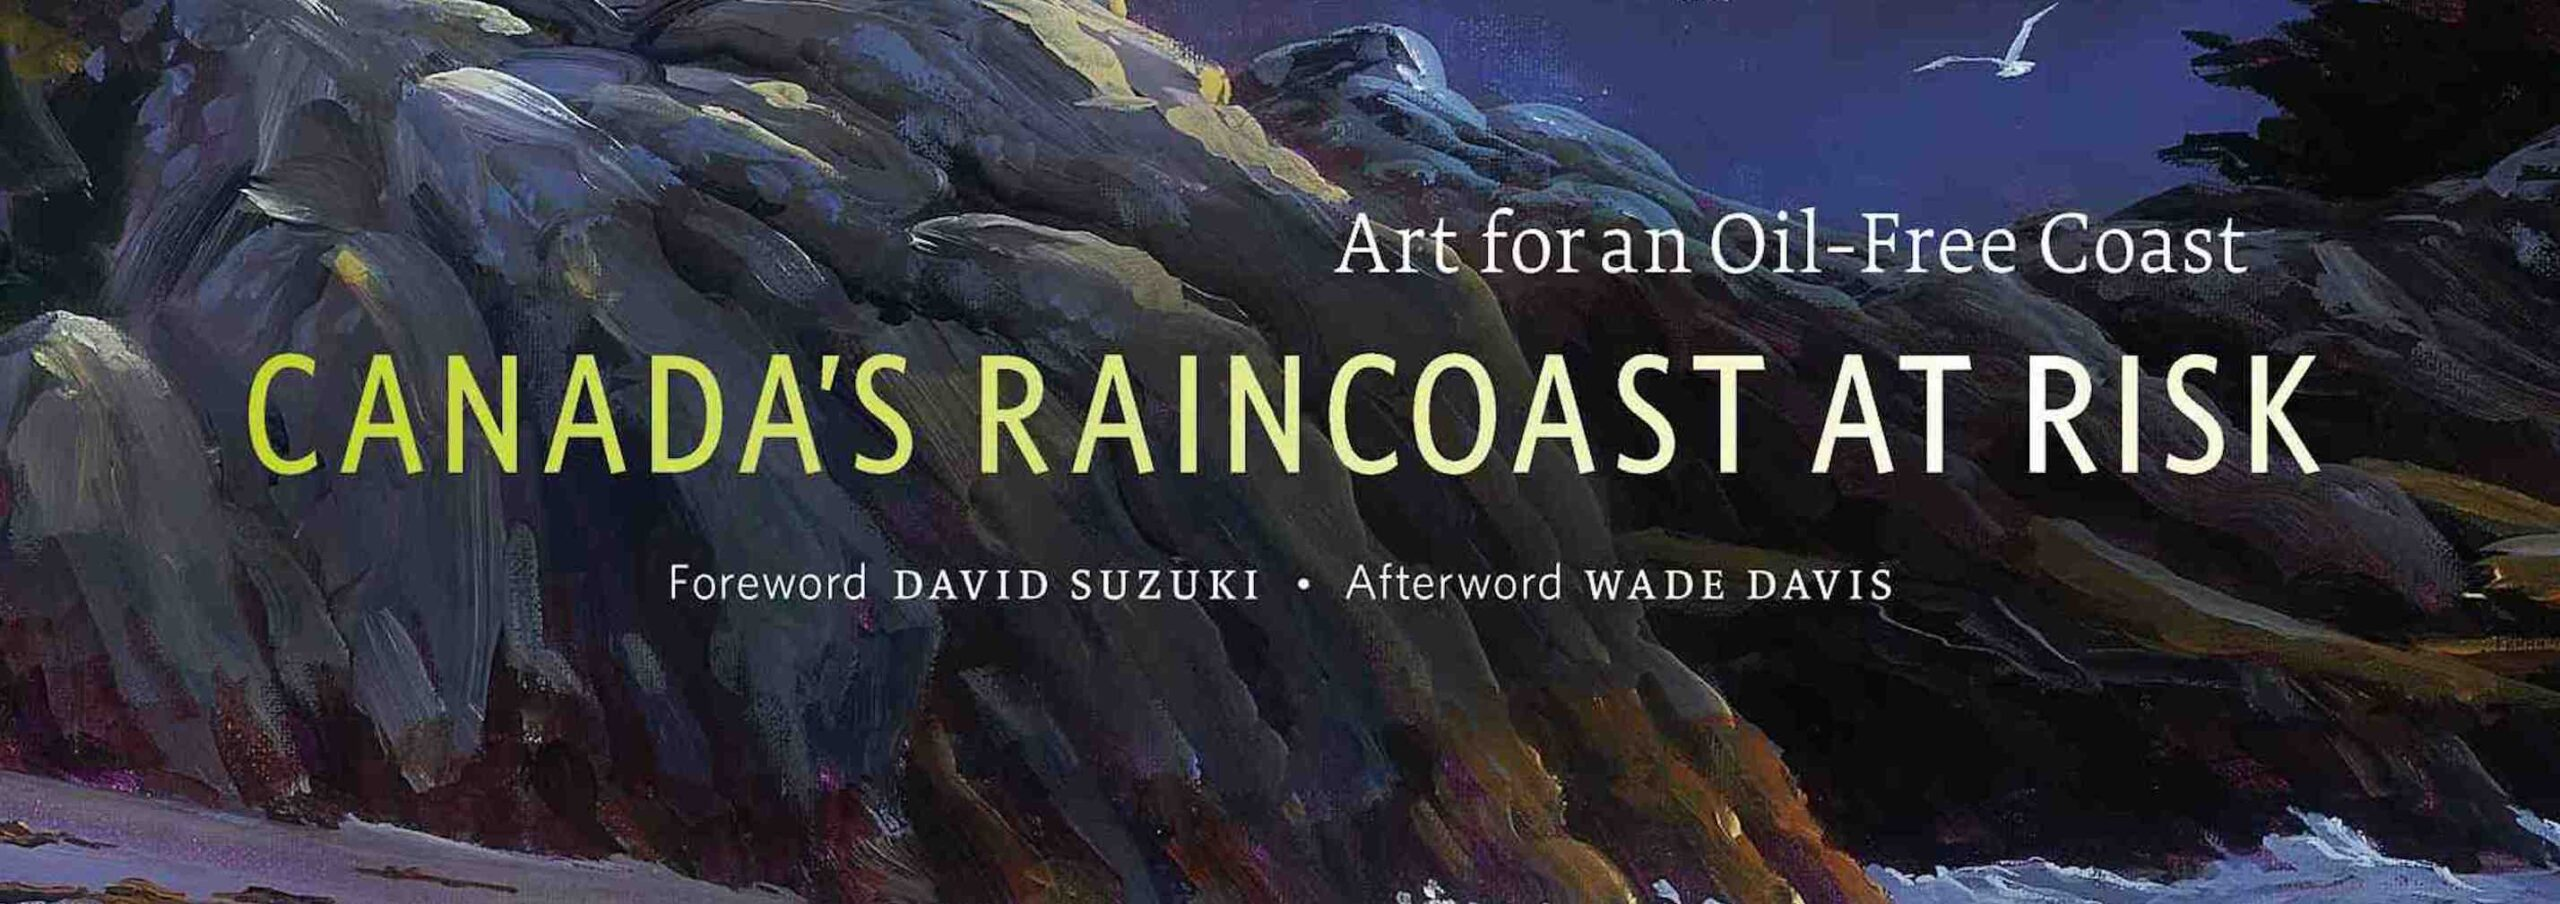 Canada's Raincoast at Risk: foreward David Suzuki, afterword Wade Davis